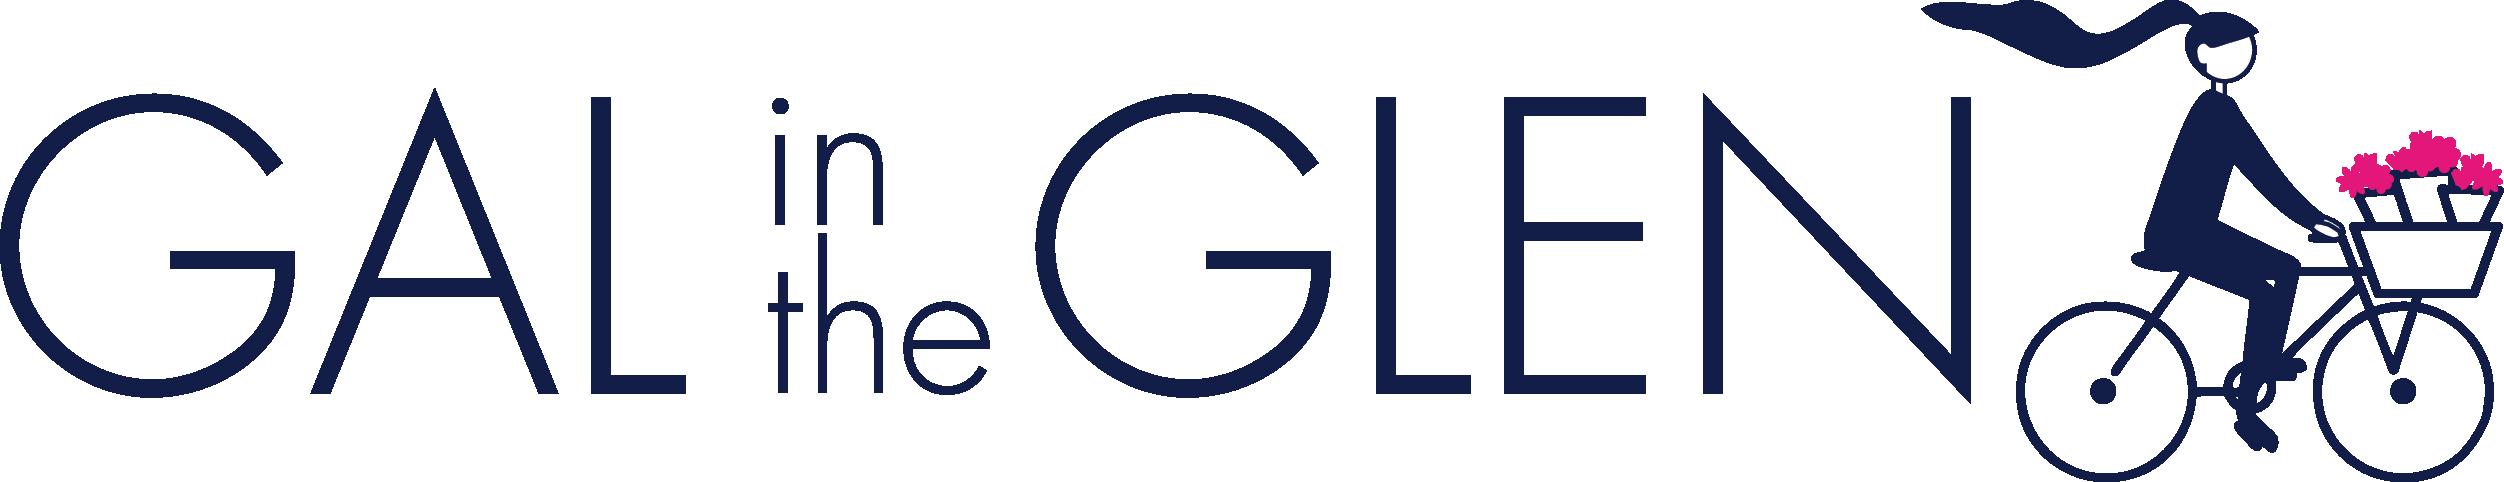 Gal in the Glen